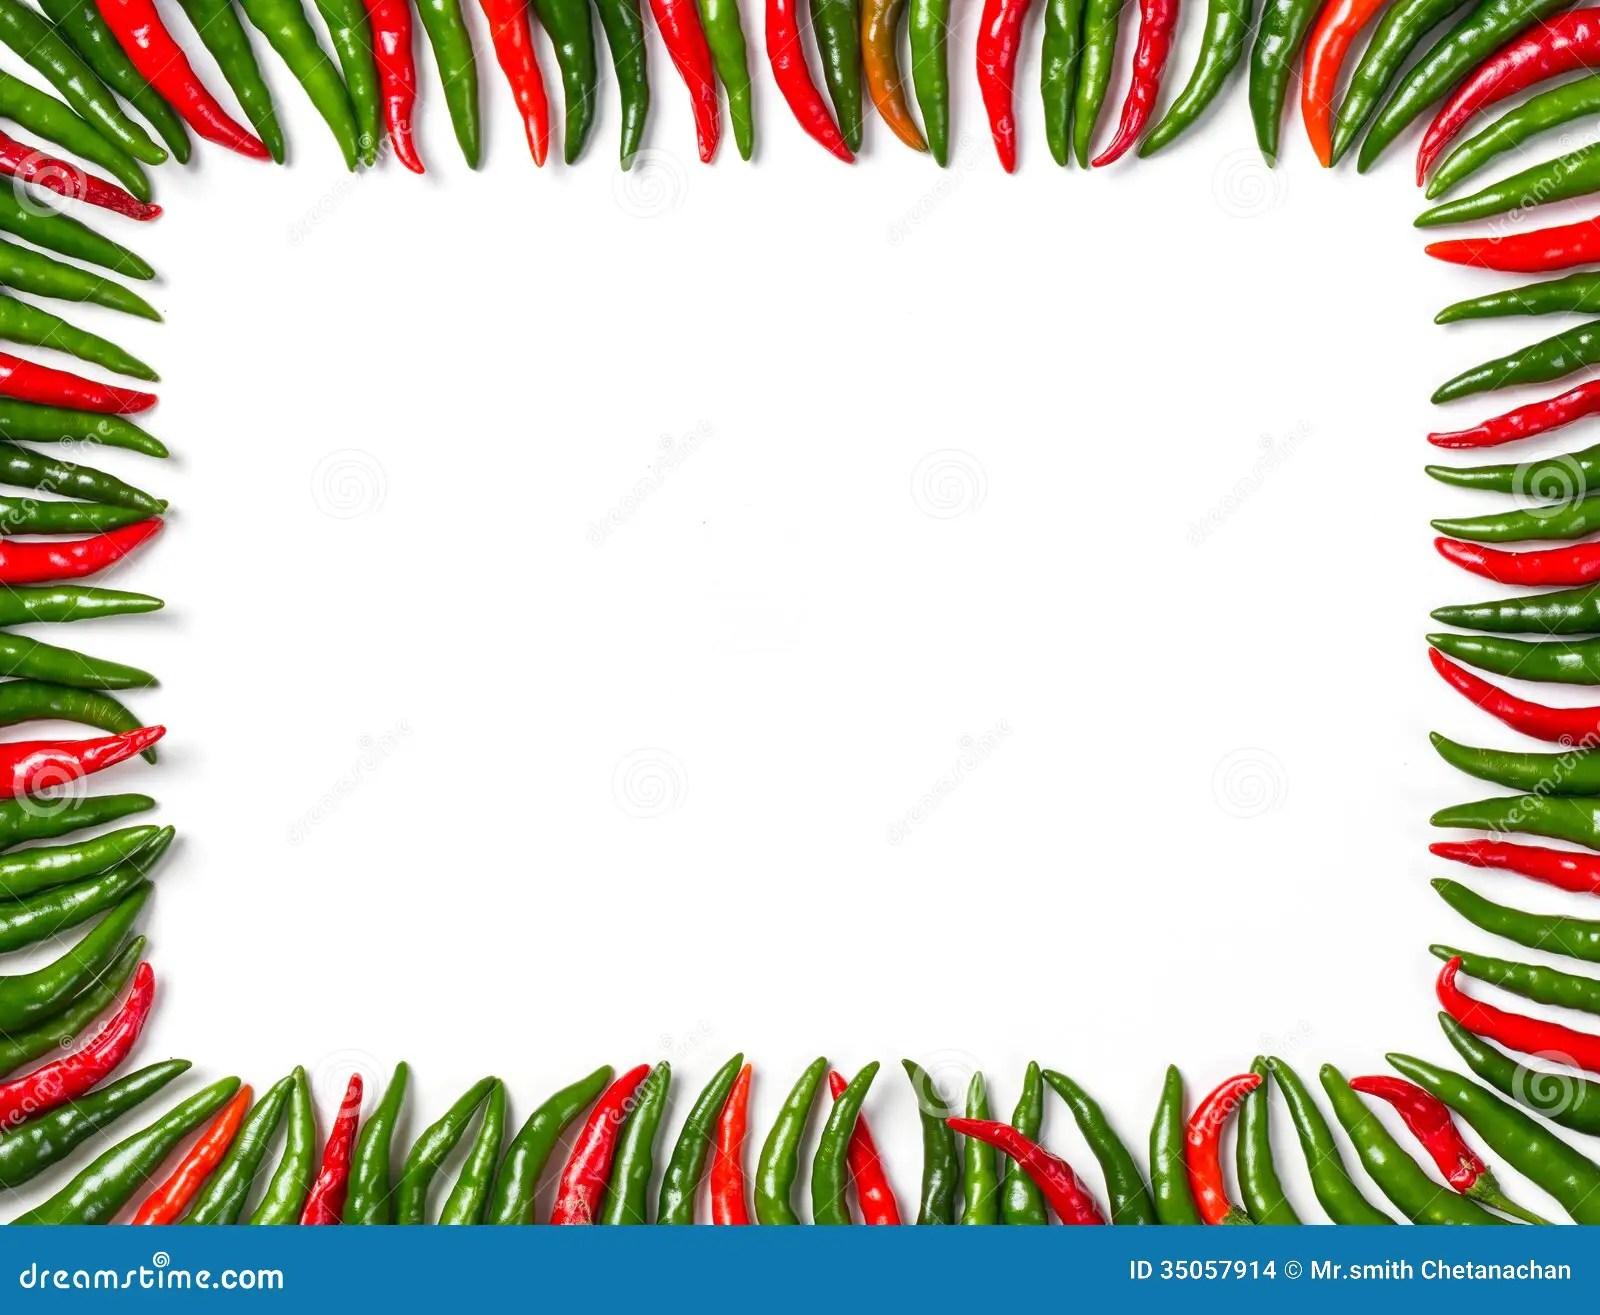 Chili Beans Clip Art Borders